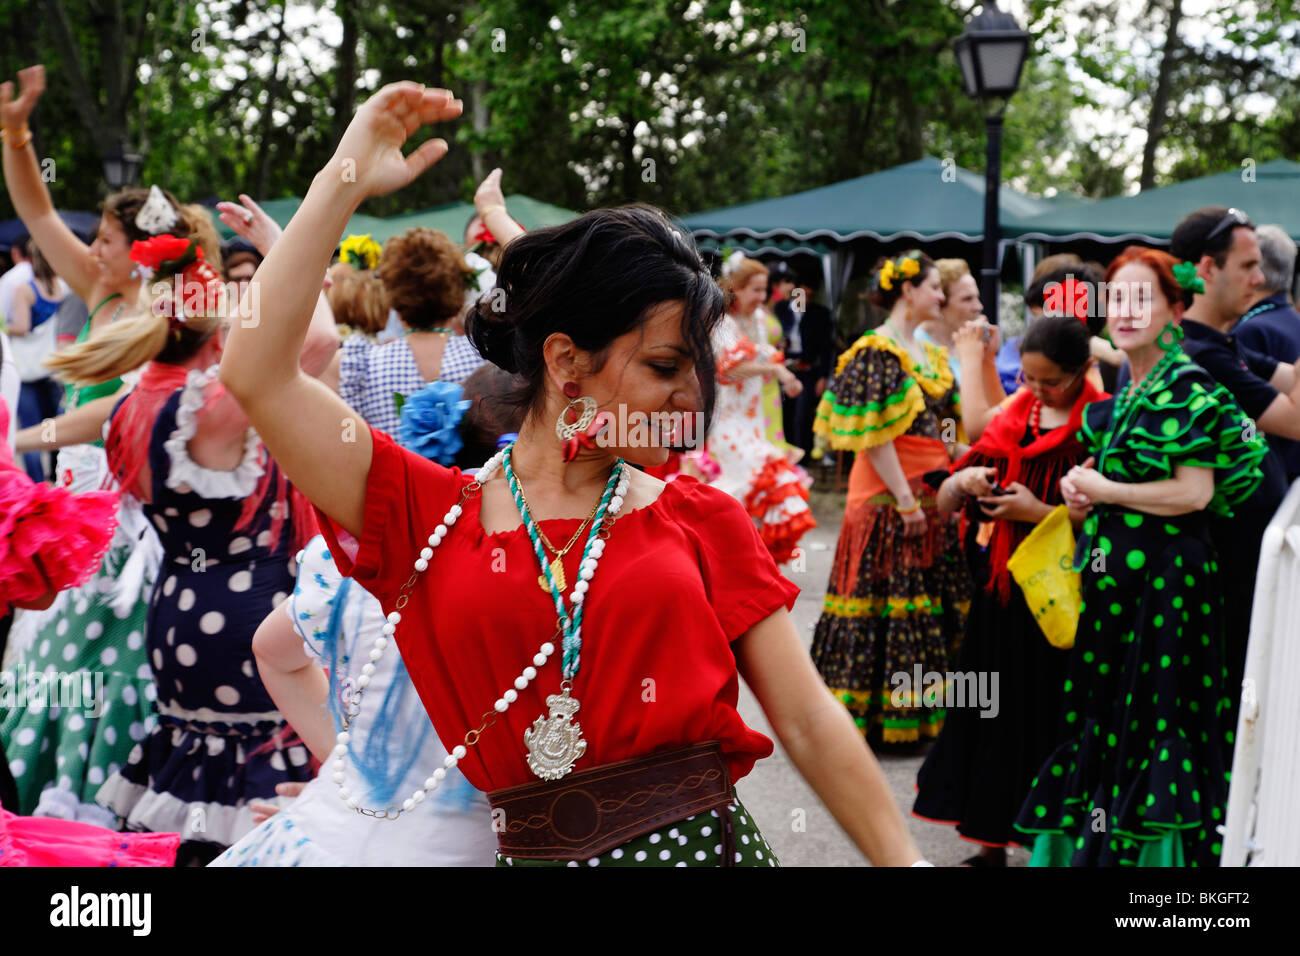 Andalusian celebration, Romeria, Madrid, Spain - Stock Image